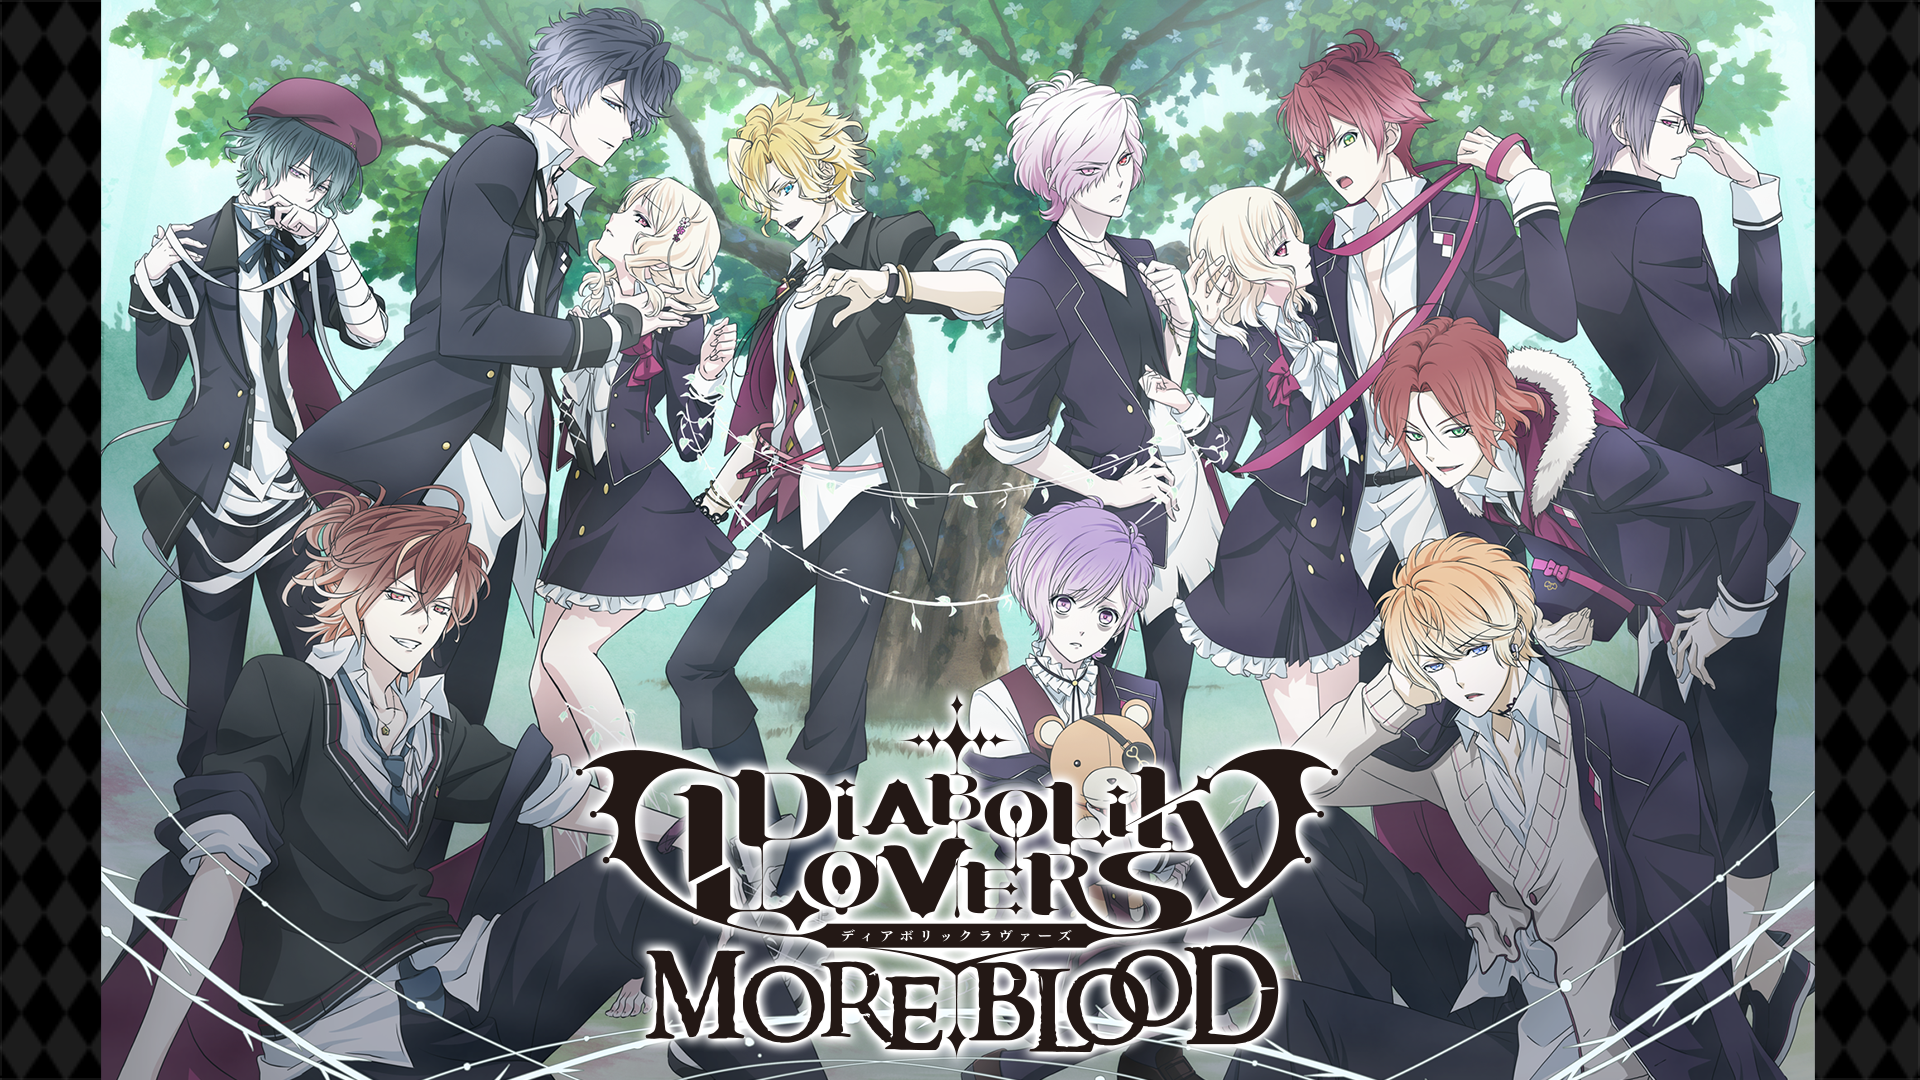 DIABOLIK LOVERS MORE,BLOOD(dアニメストア)